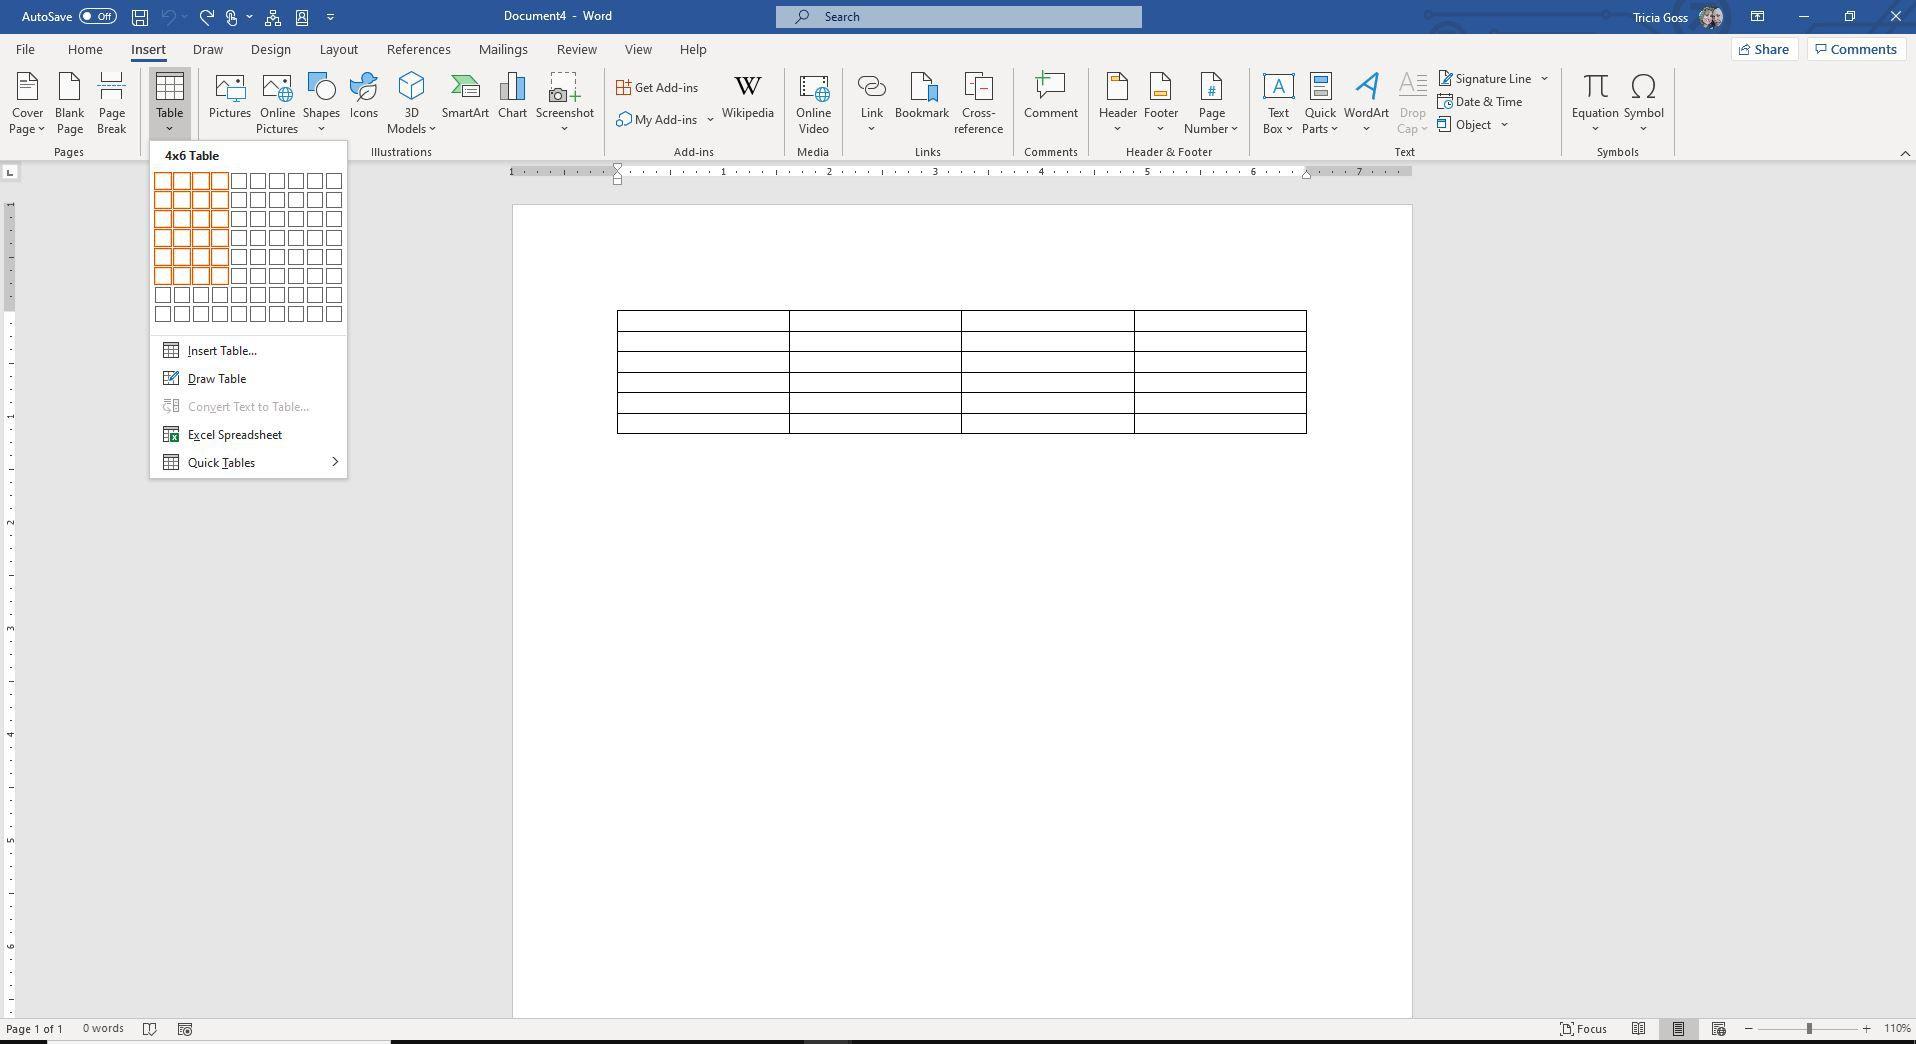 Screenshot of Insert Table